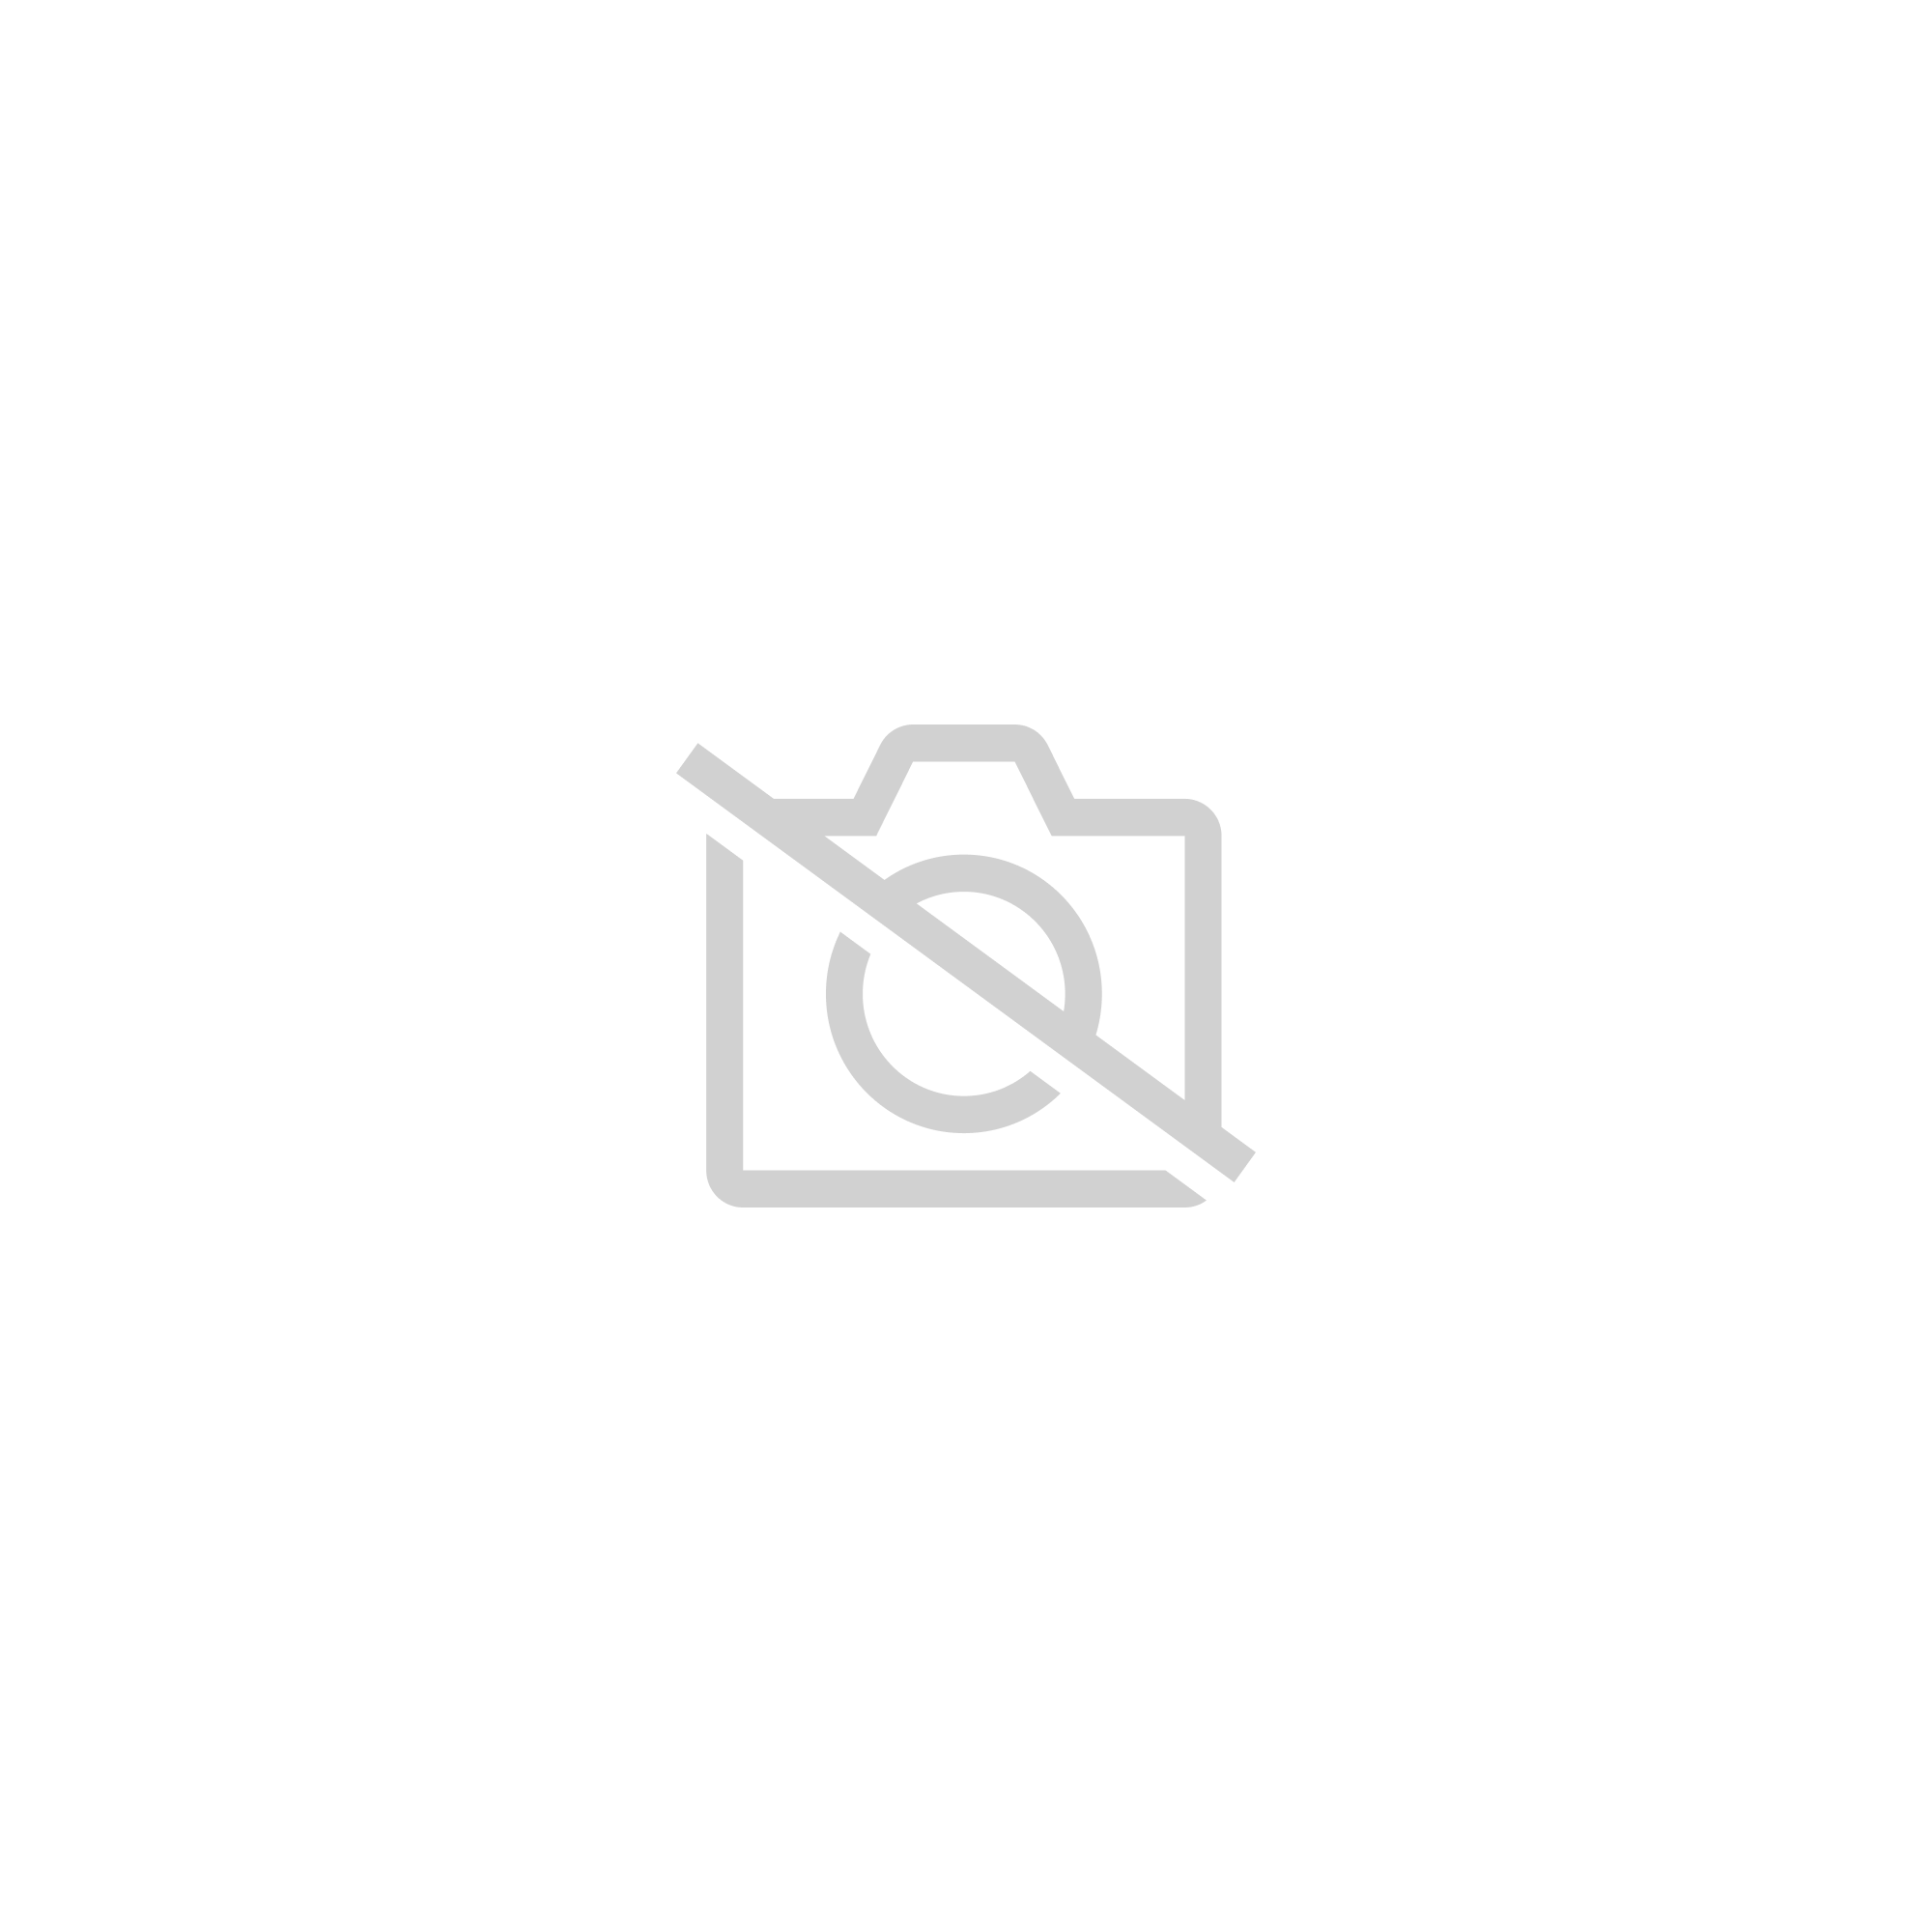 Asics Gel Cumulus 18 Noir Bleu T6c3n 0190